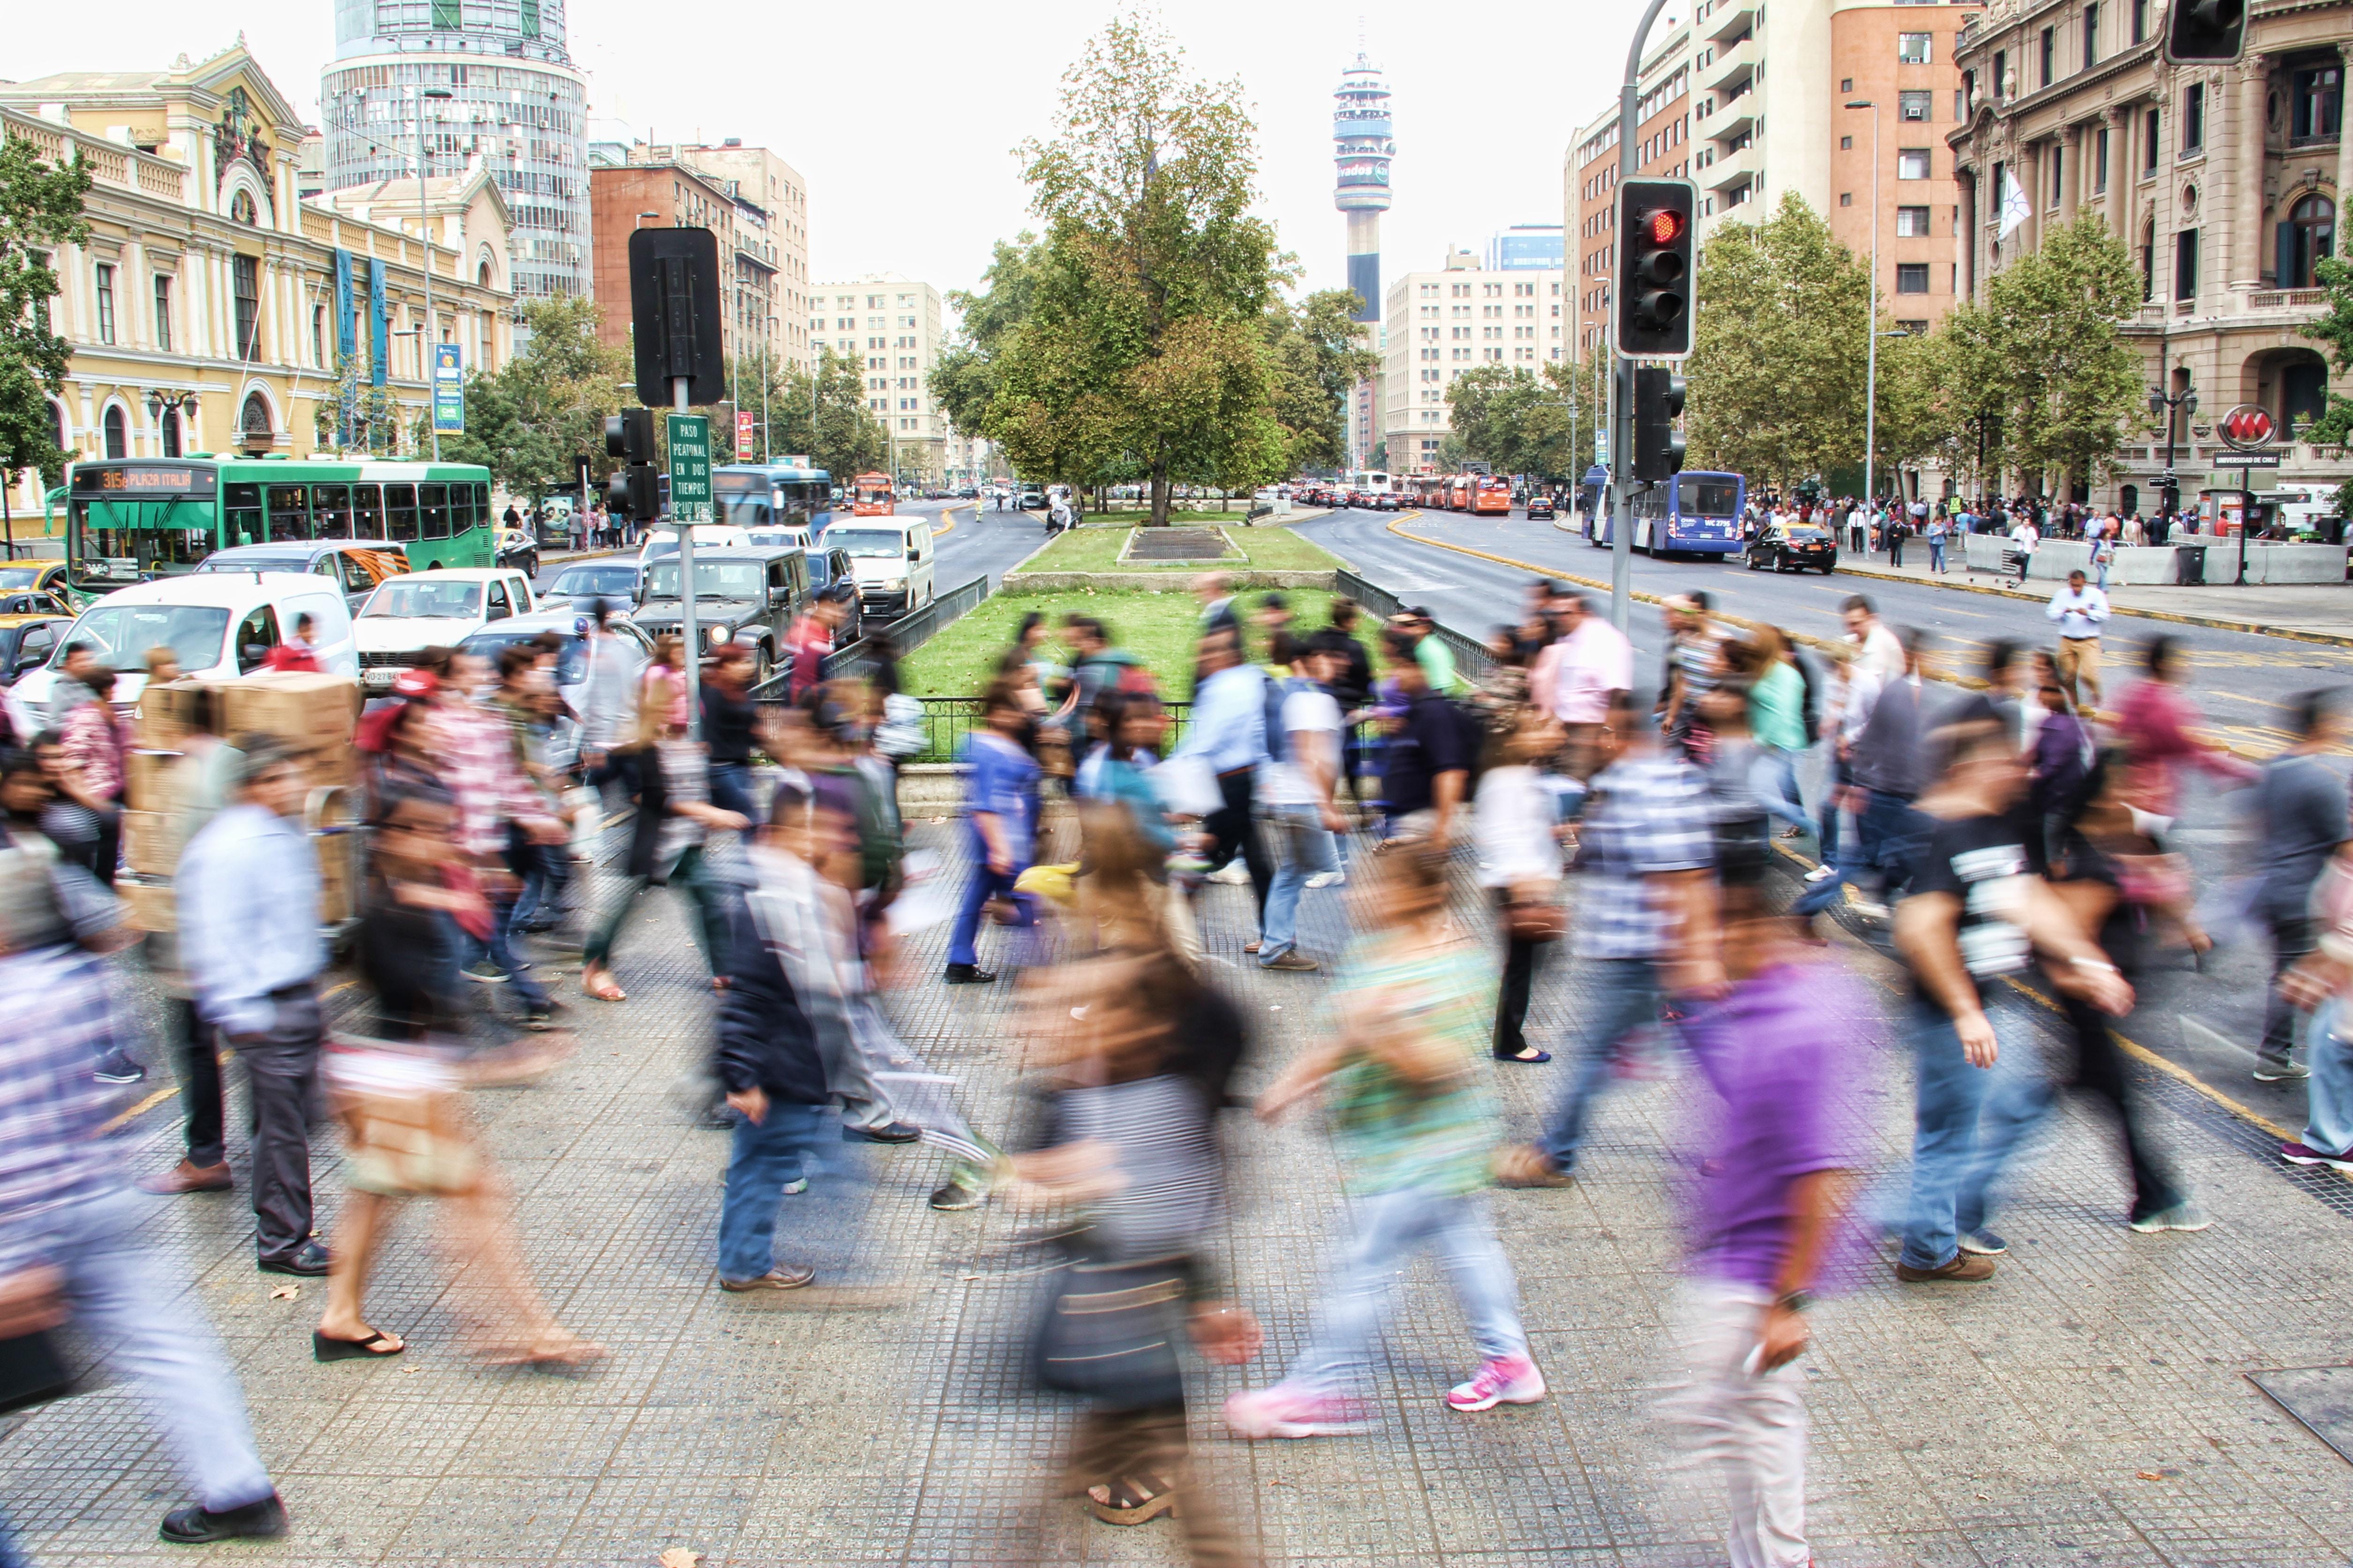 A long-exposure shot of a busy crosswalk in Santiago